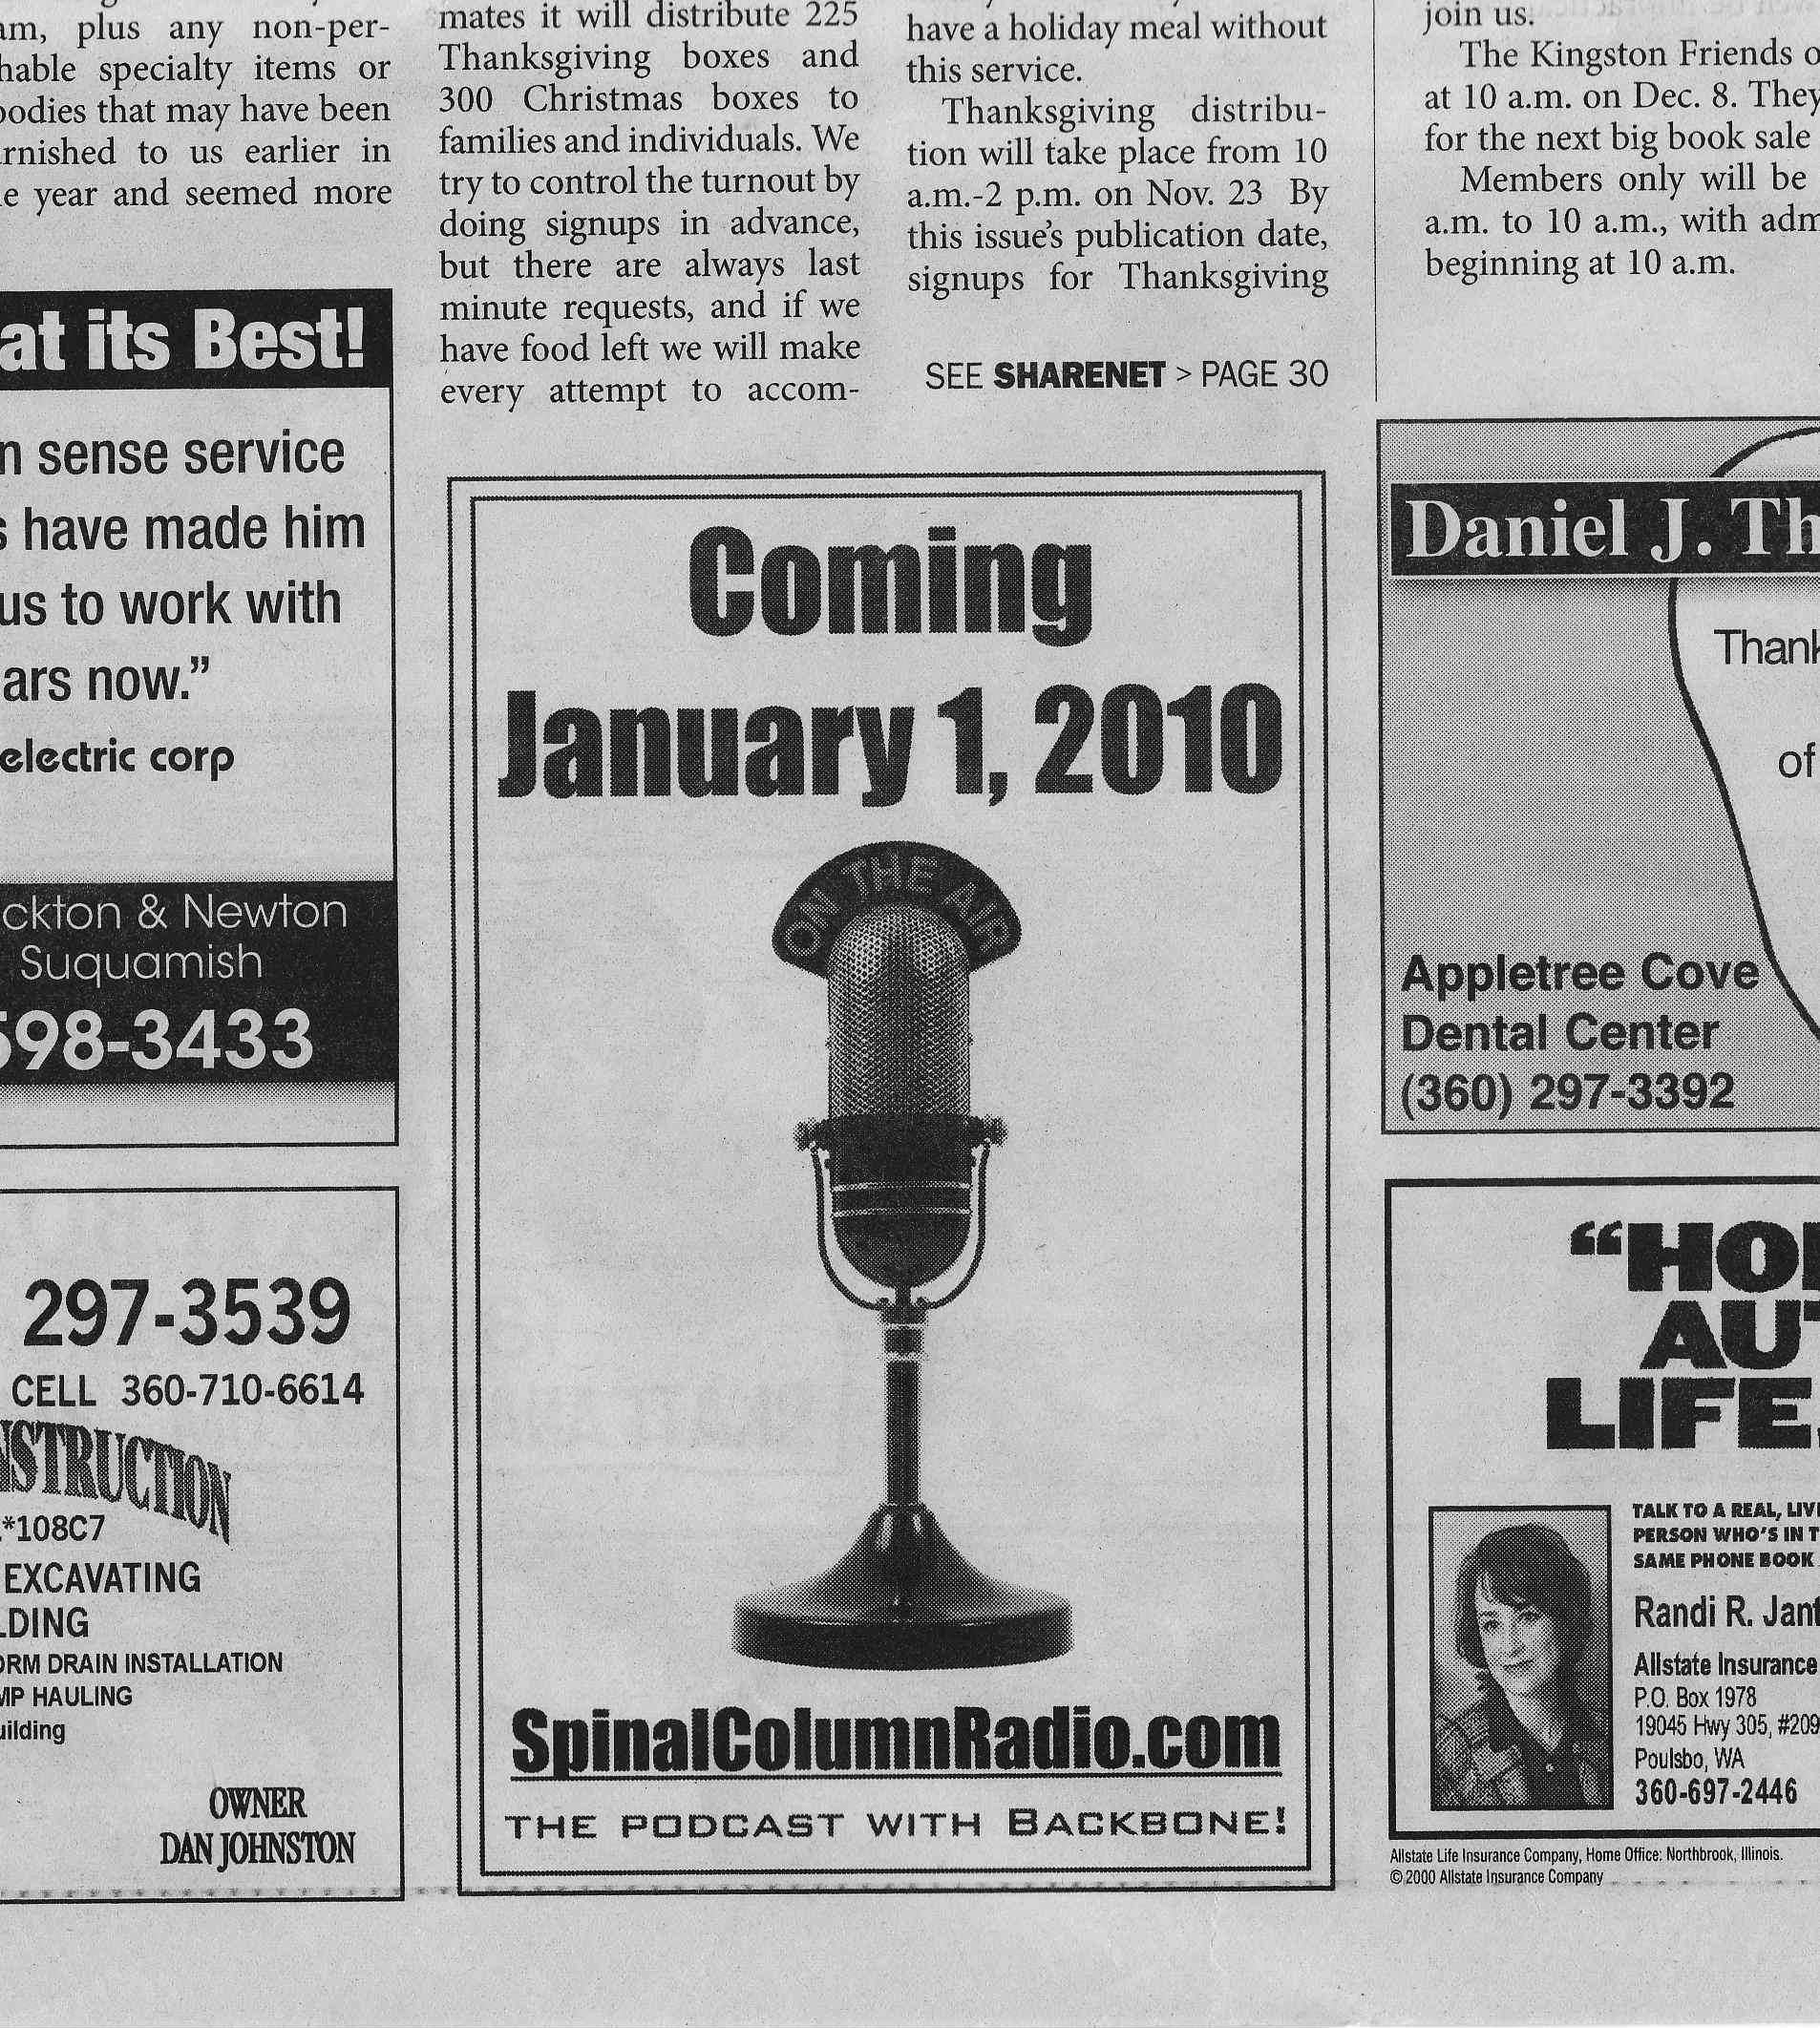 Promotional Bin | SpinalColumnRadio